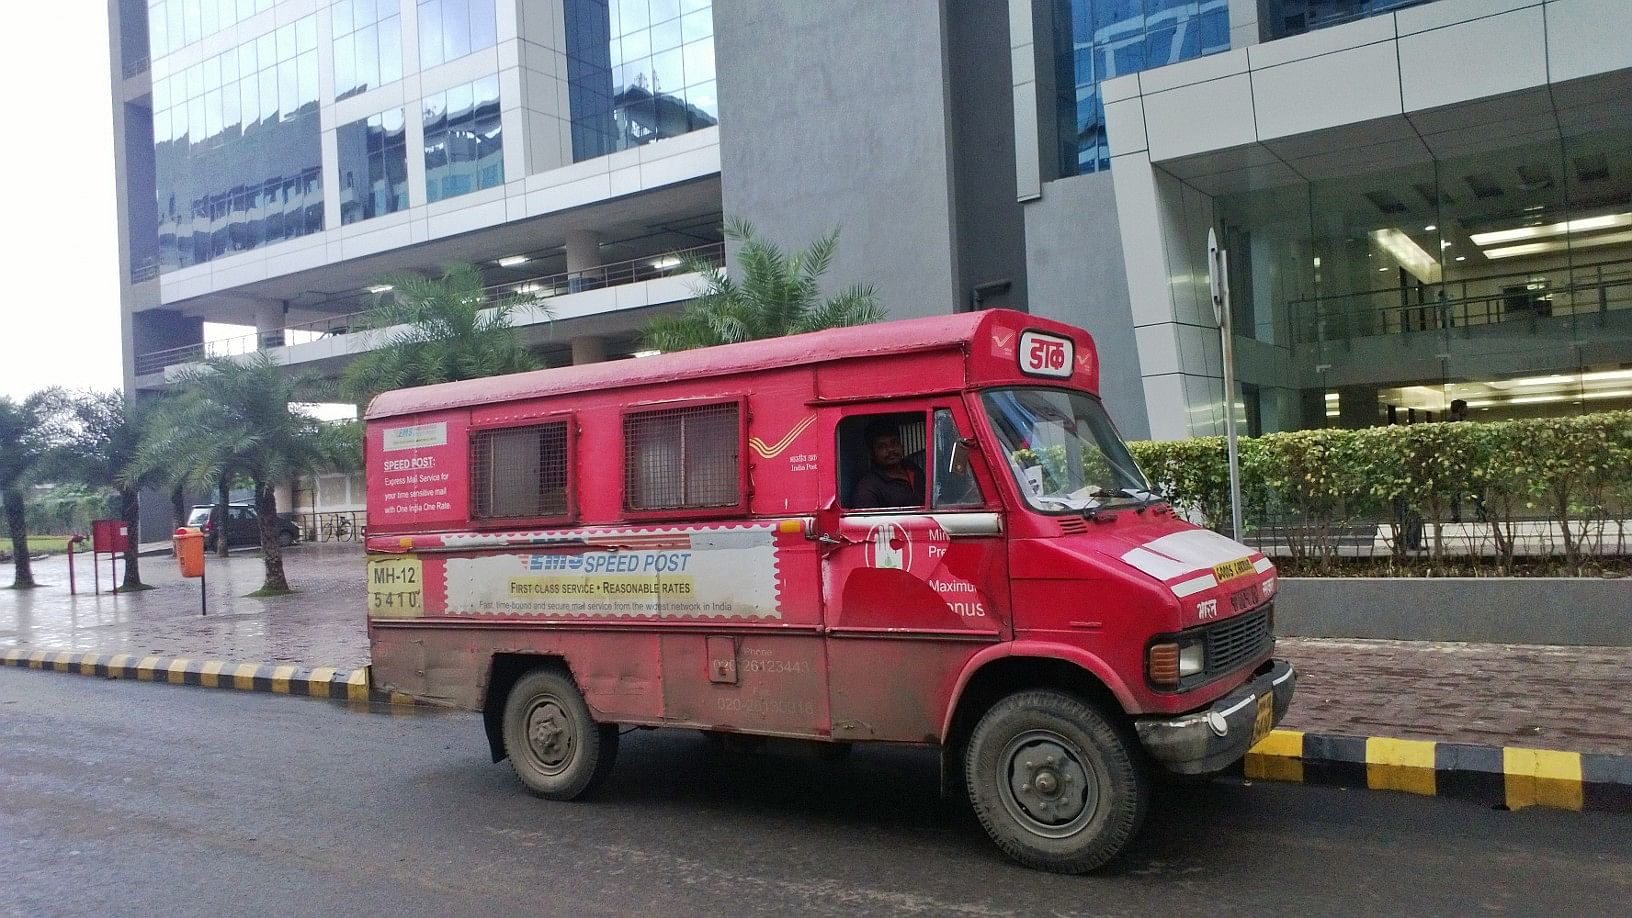 Indian_Postal_Service_TATA_Delivery_Van,_Pune_Maharashtra,_July_2013